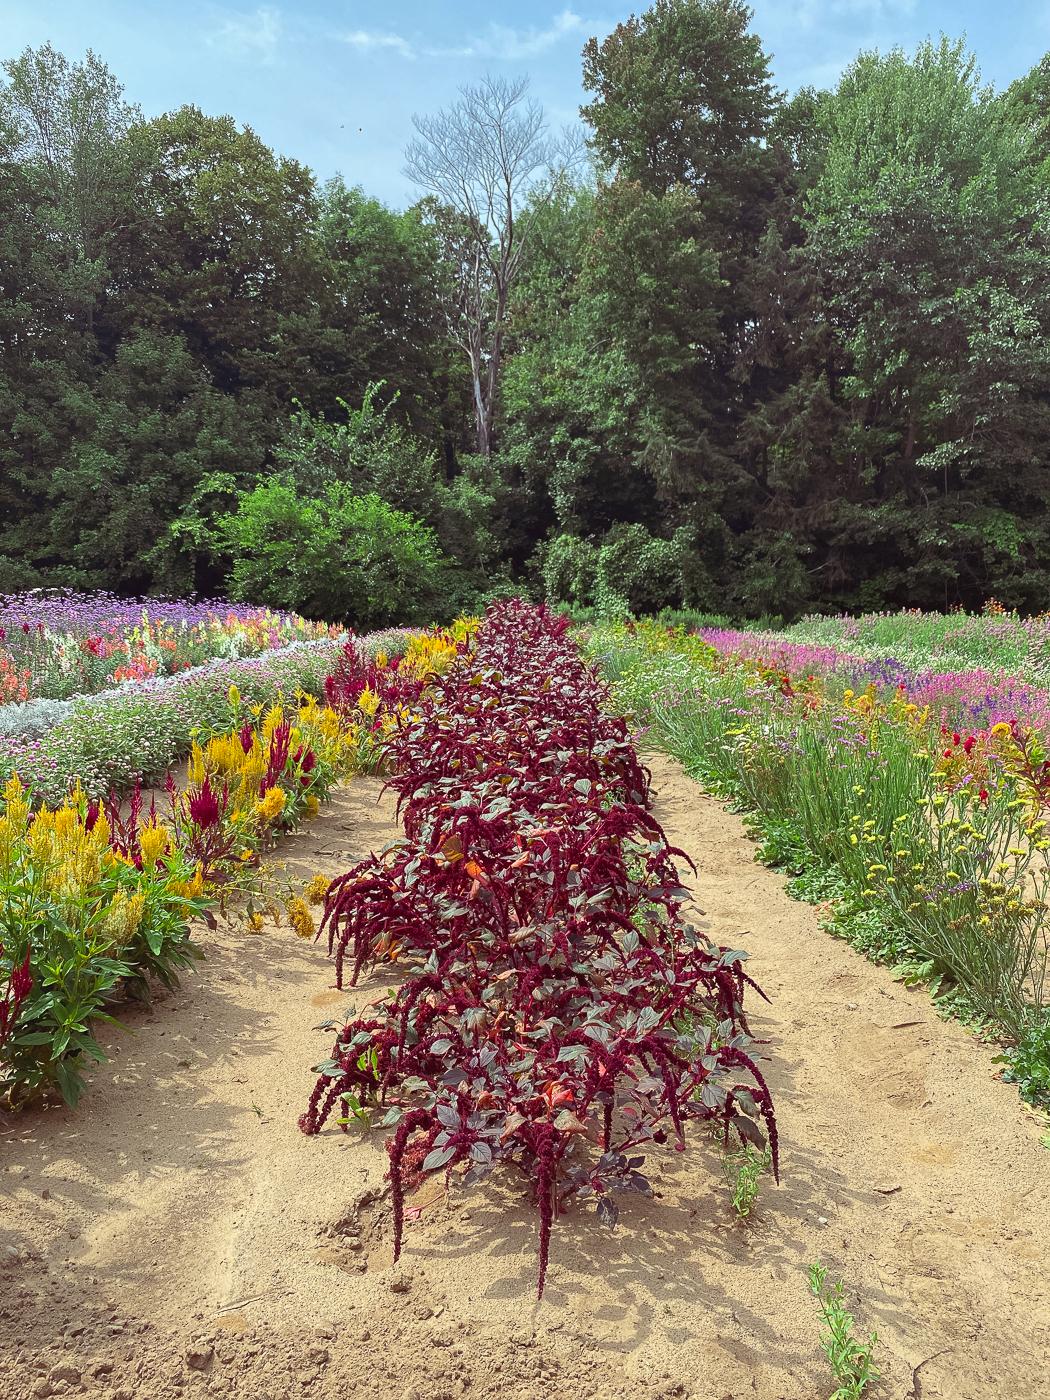 Maroon amaranth, summer garden flowers, blooming flowers, summer flowers that bloom